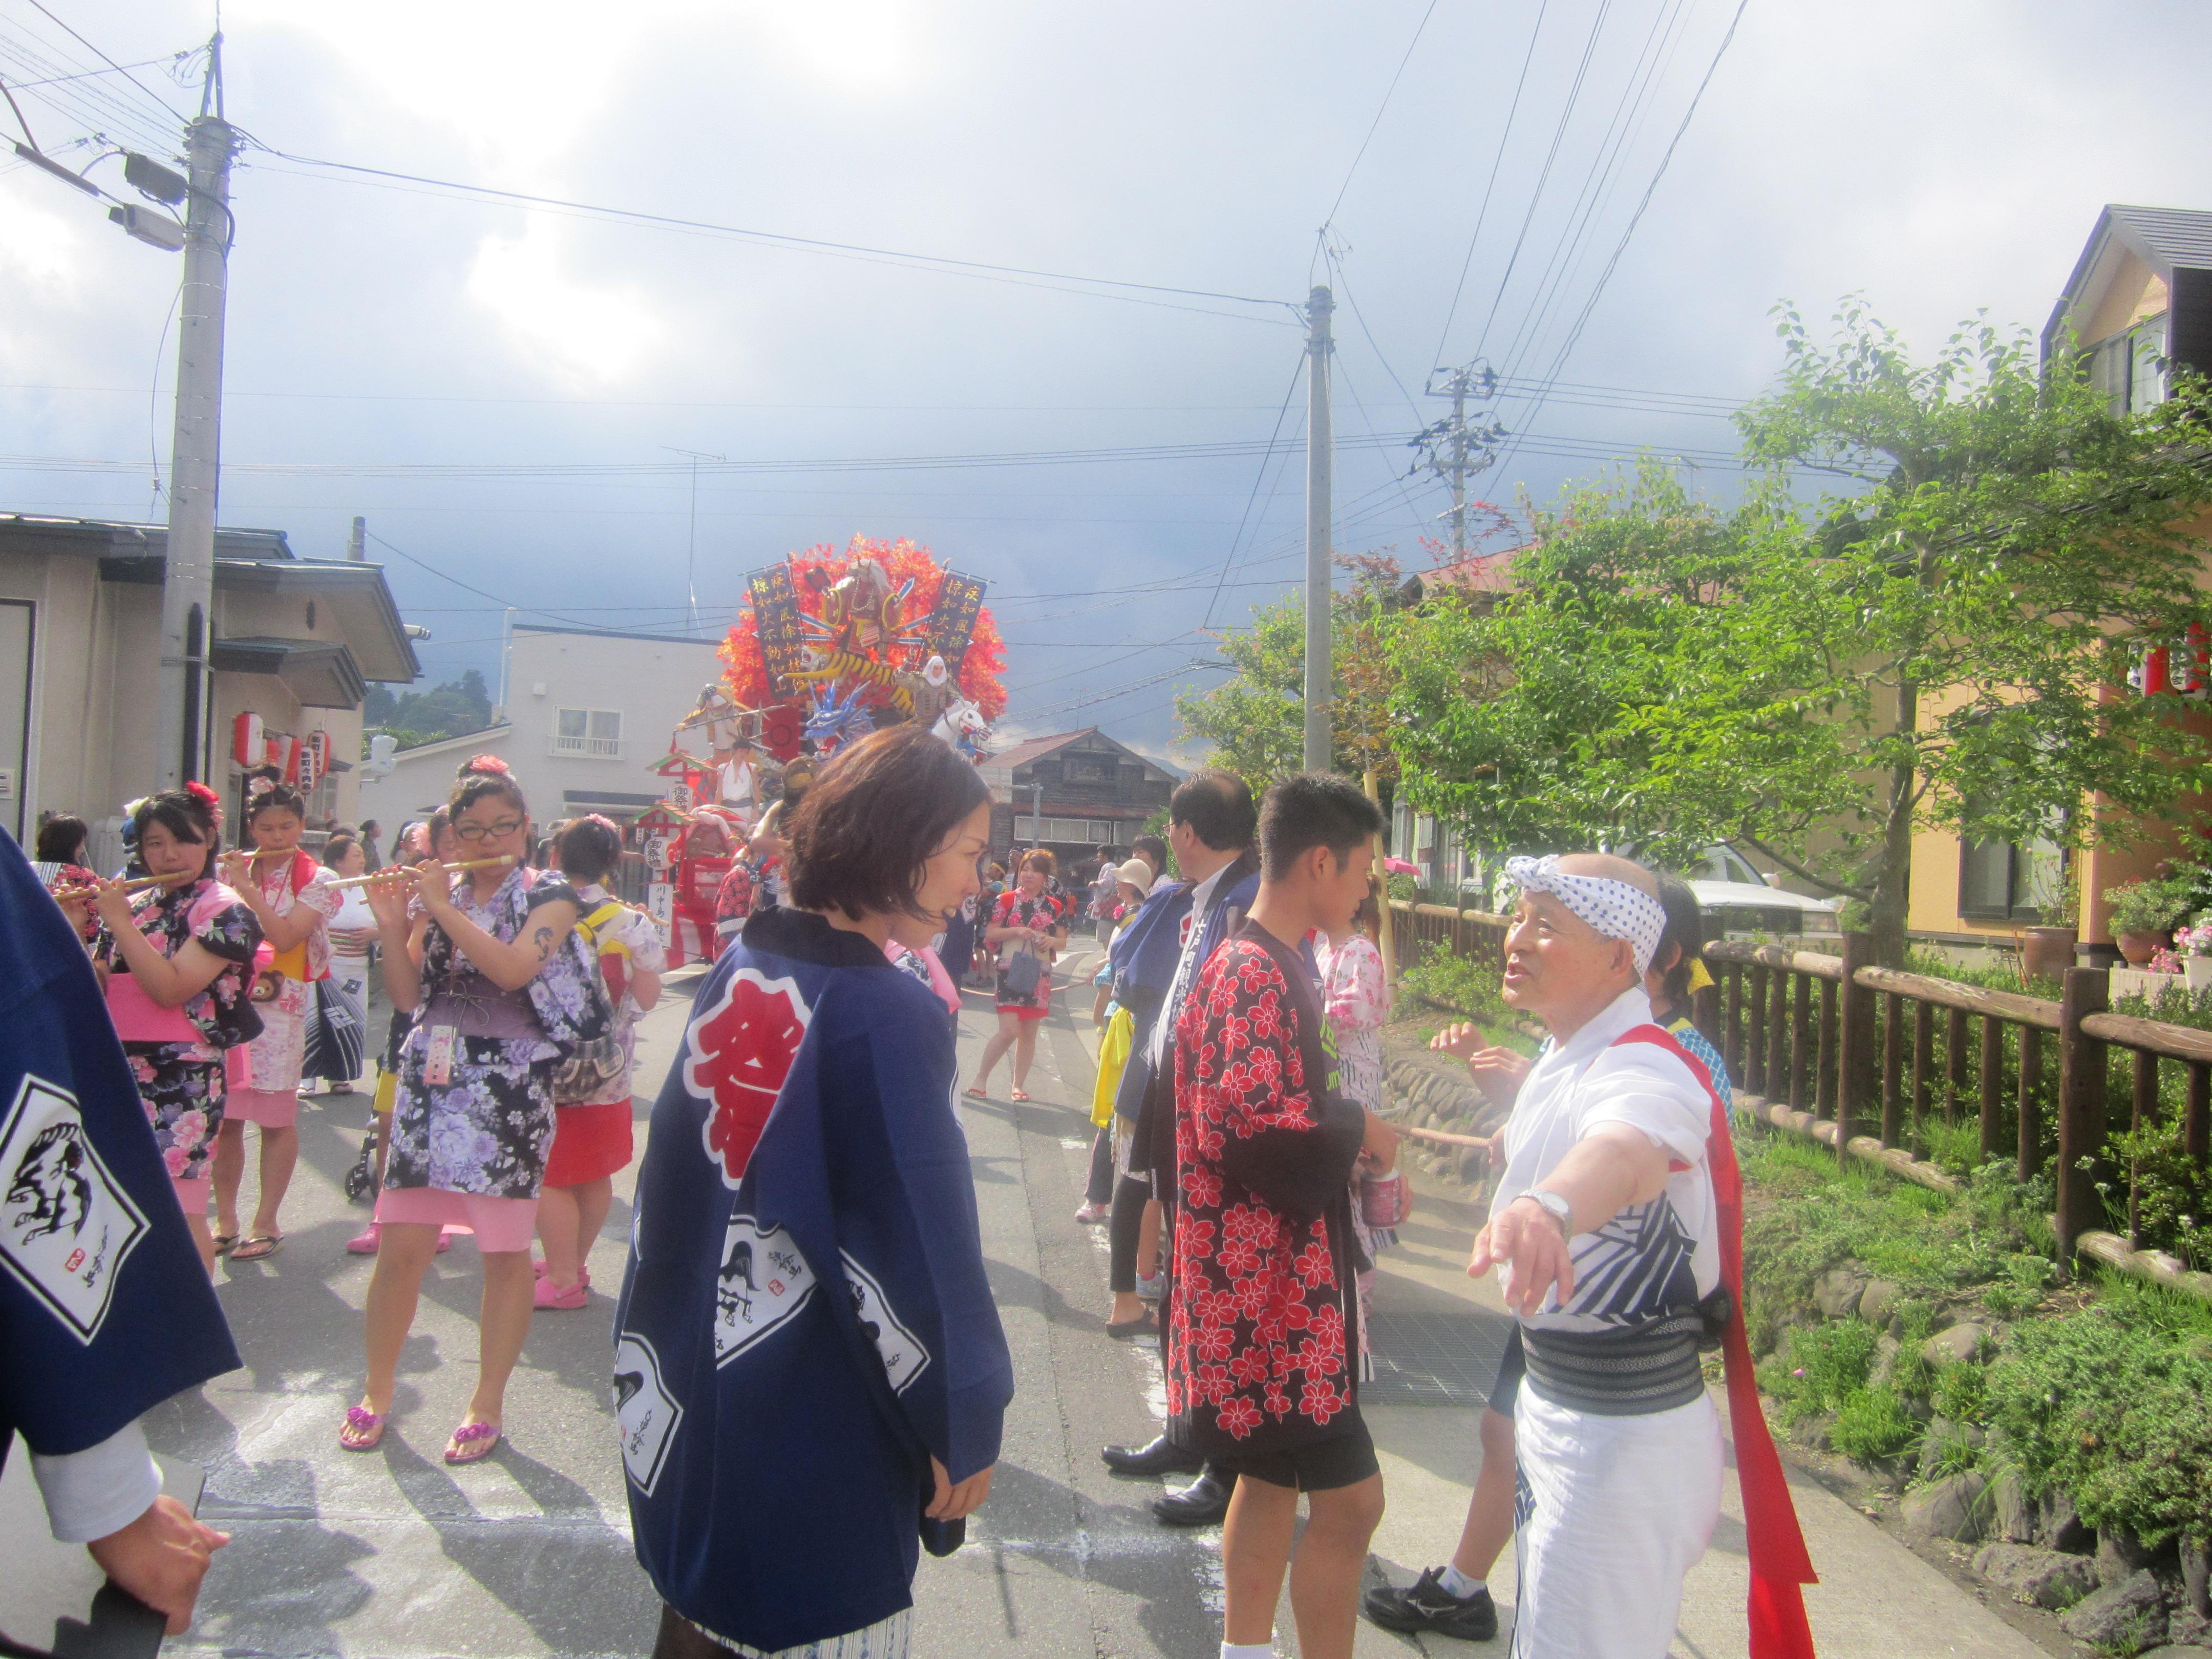 IMG 4249 - 麻布十番納涼祭り25,26日(七戸町出店)